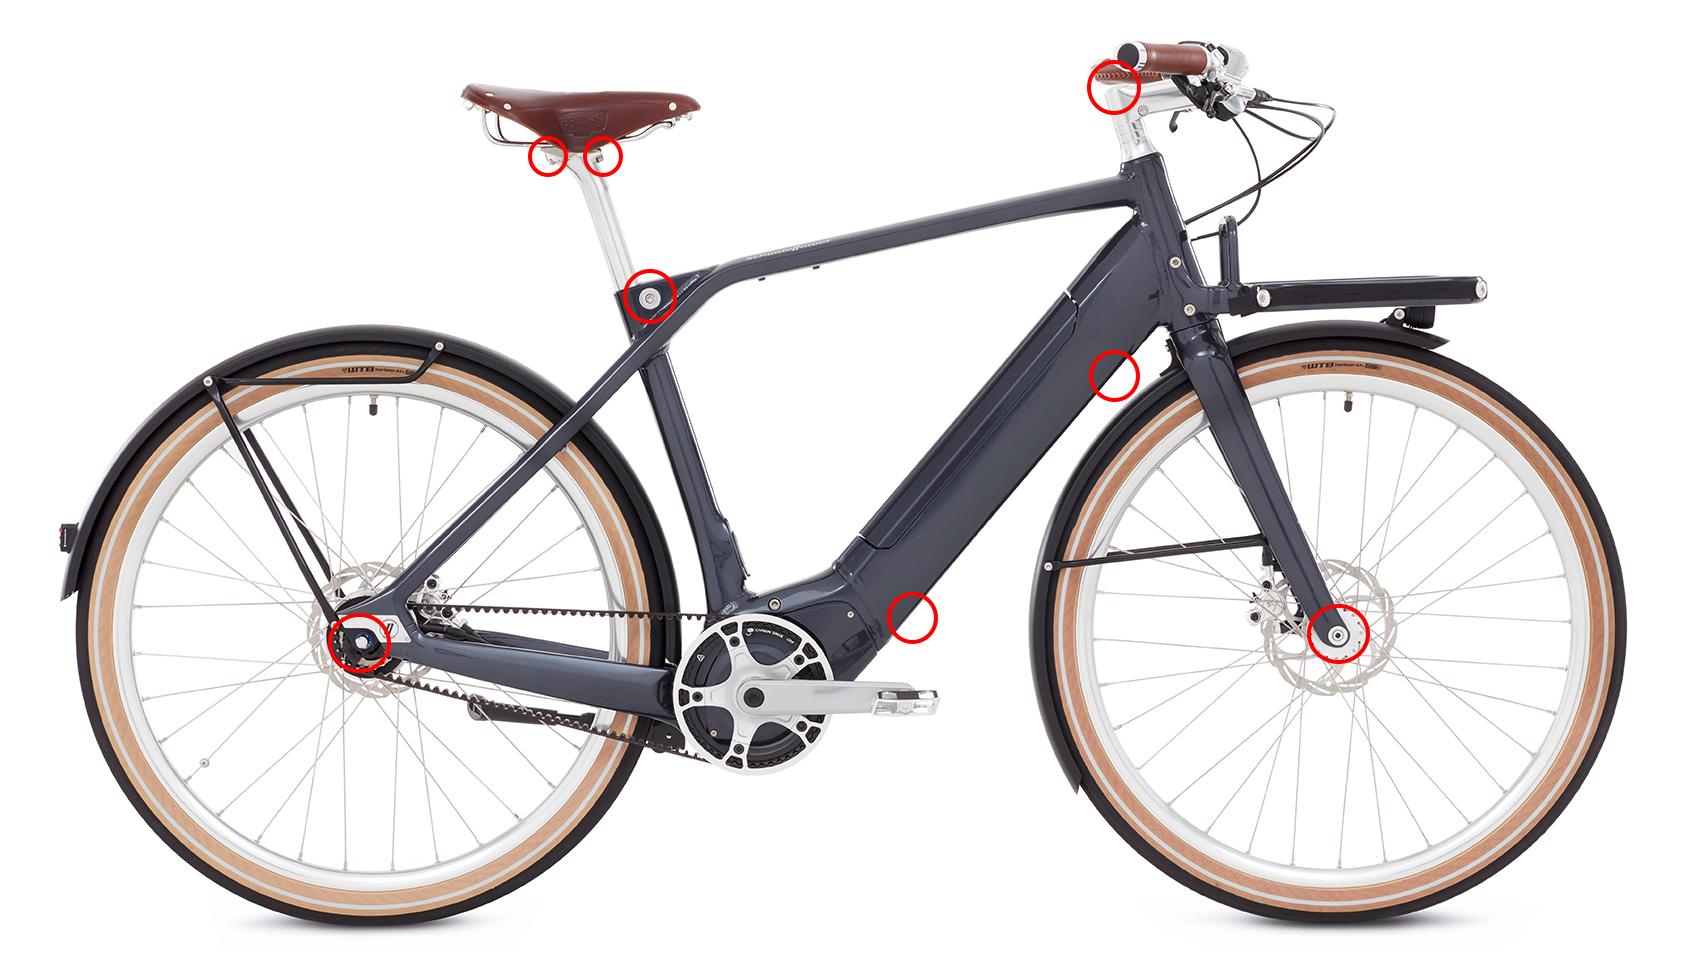 E-bike models